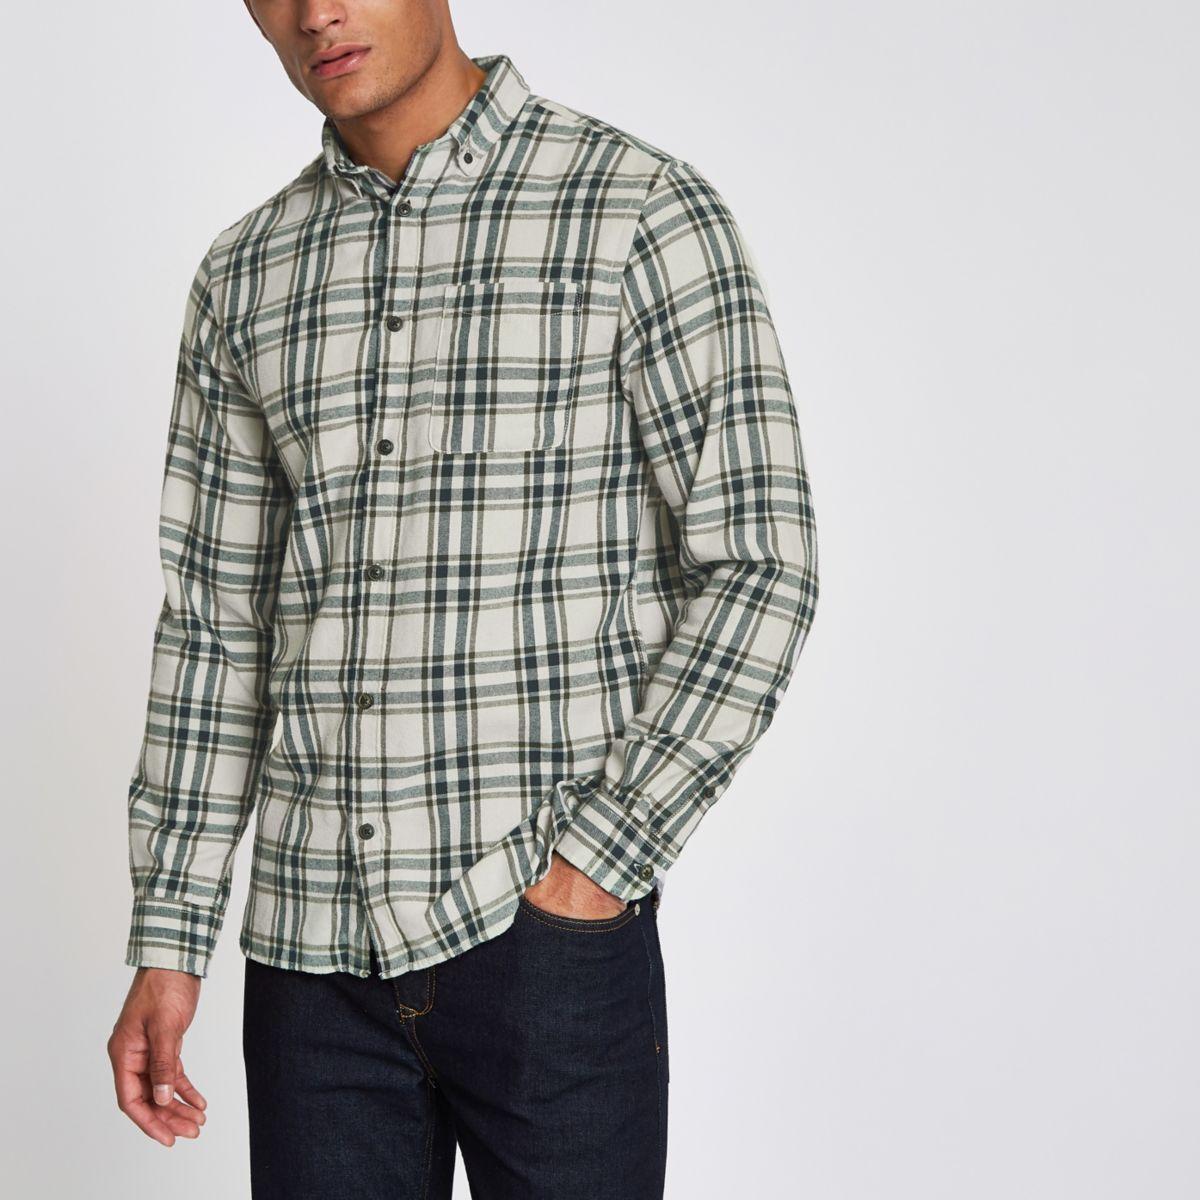 Jack & Jones Original green check shirt